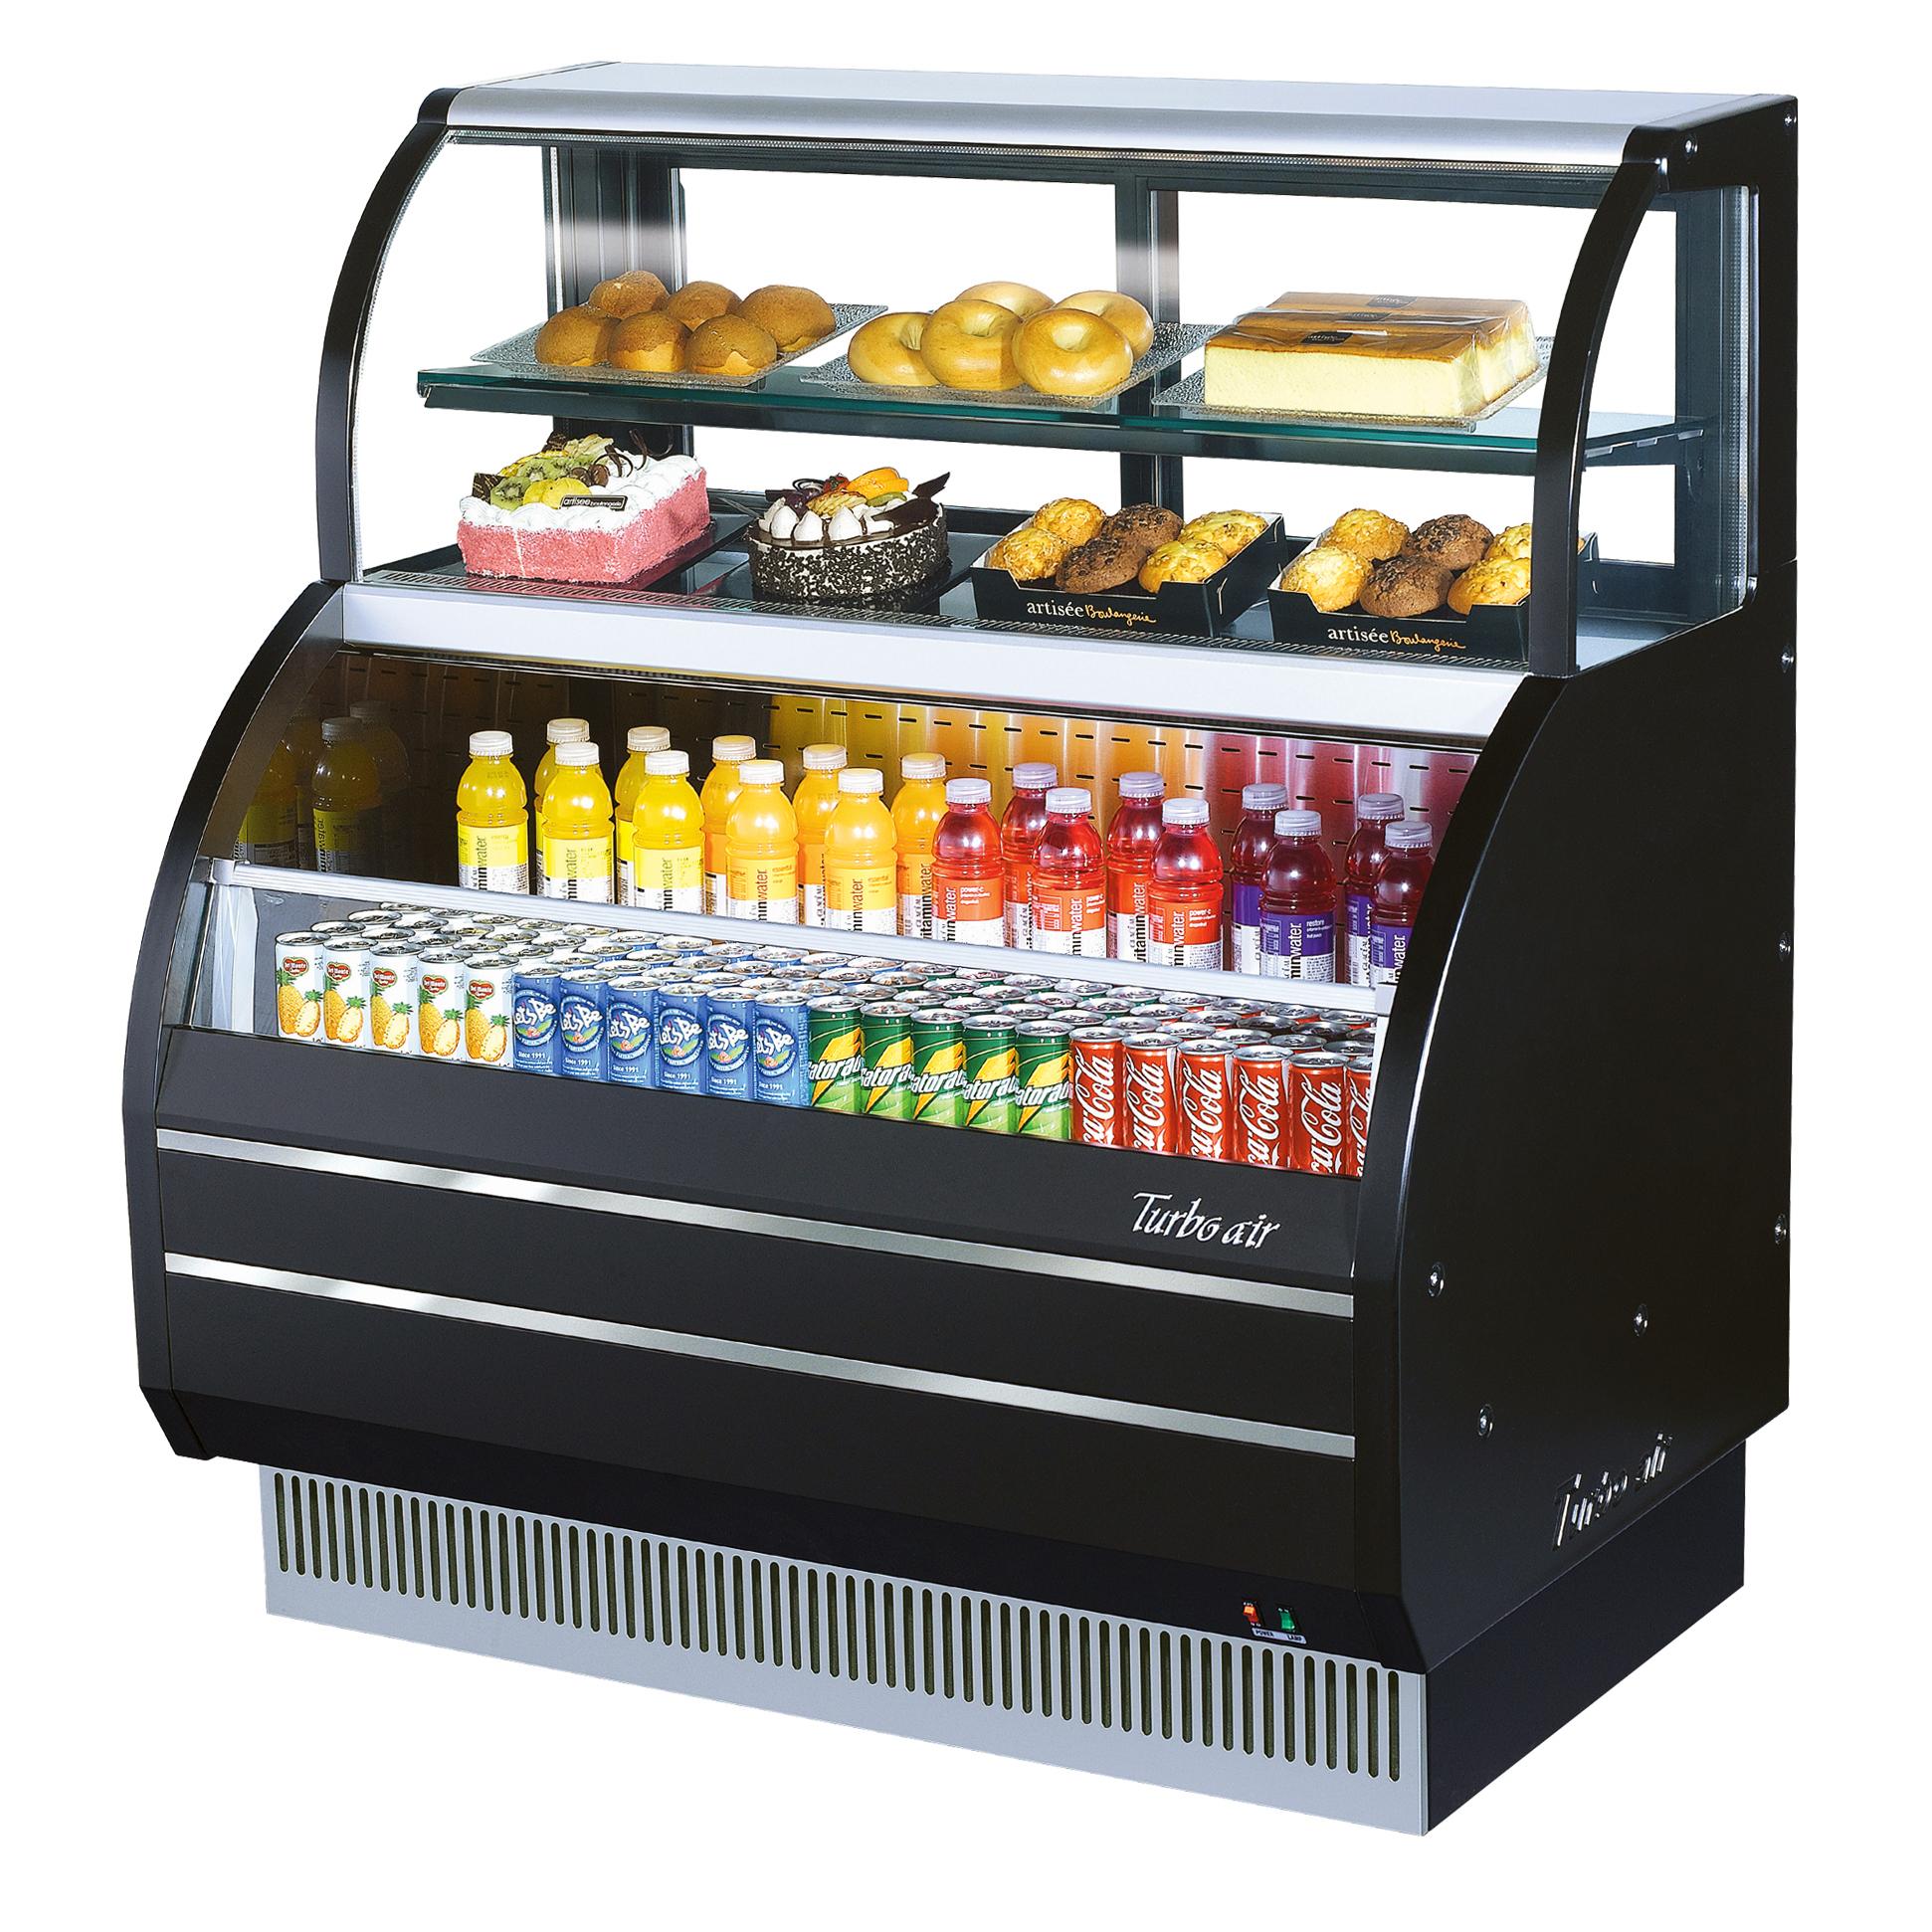 Turbo Air TOM-W-60SB-N merchandiser, open refrigerated display